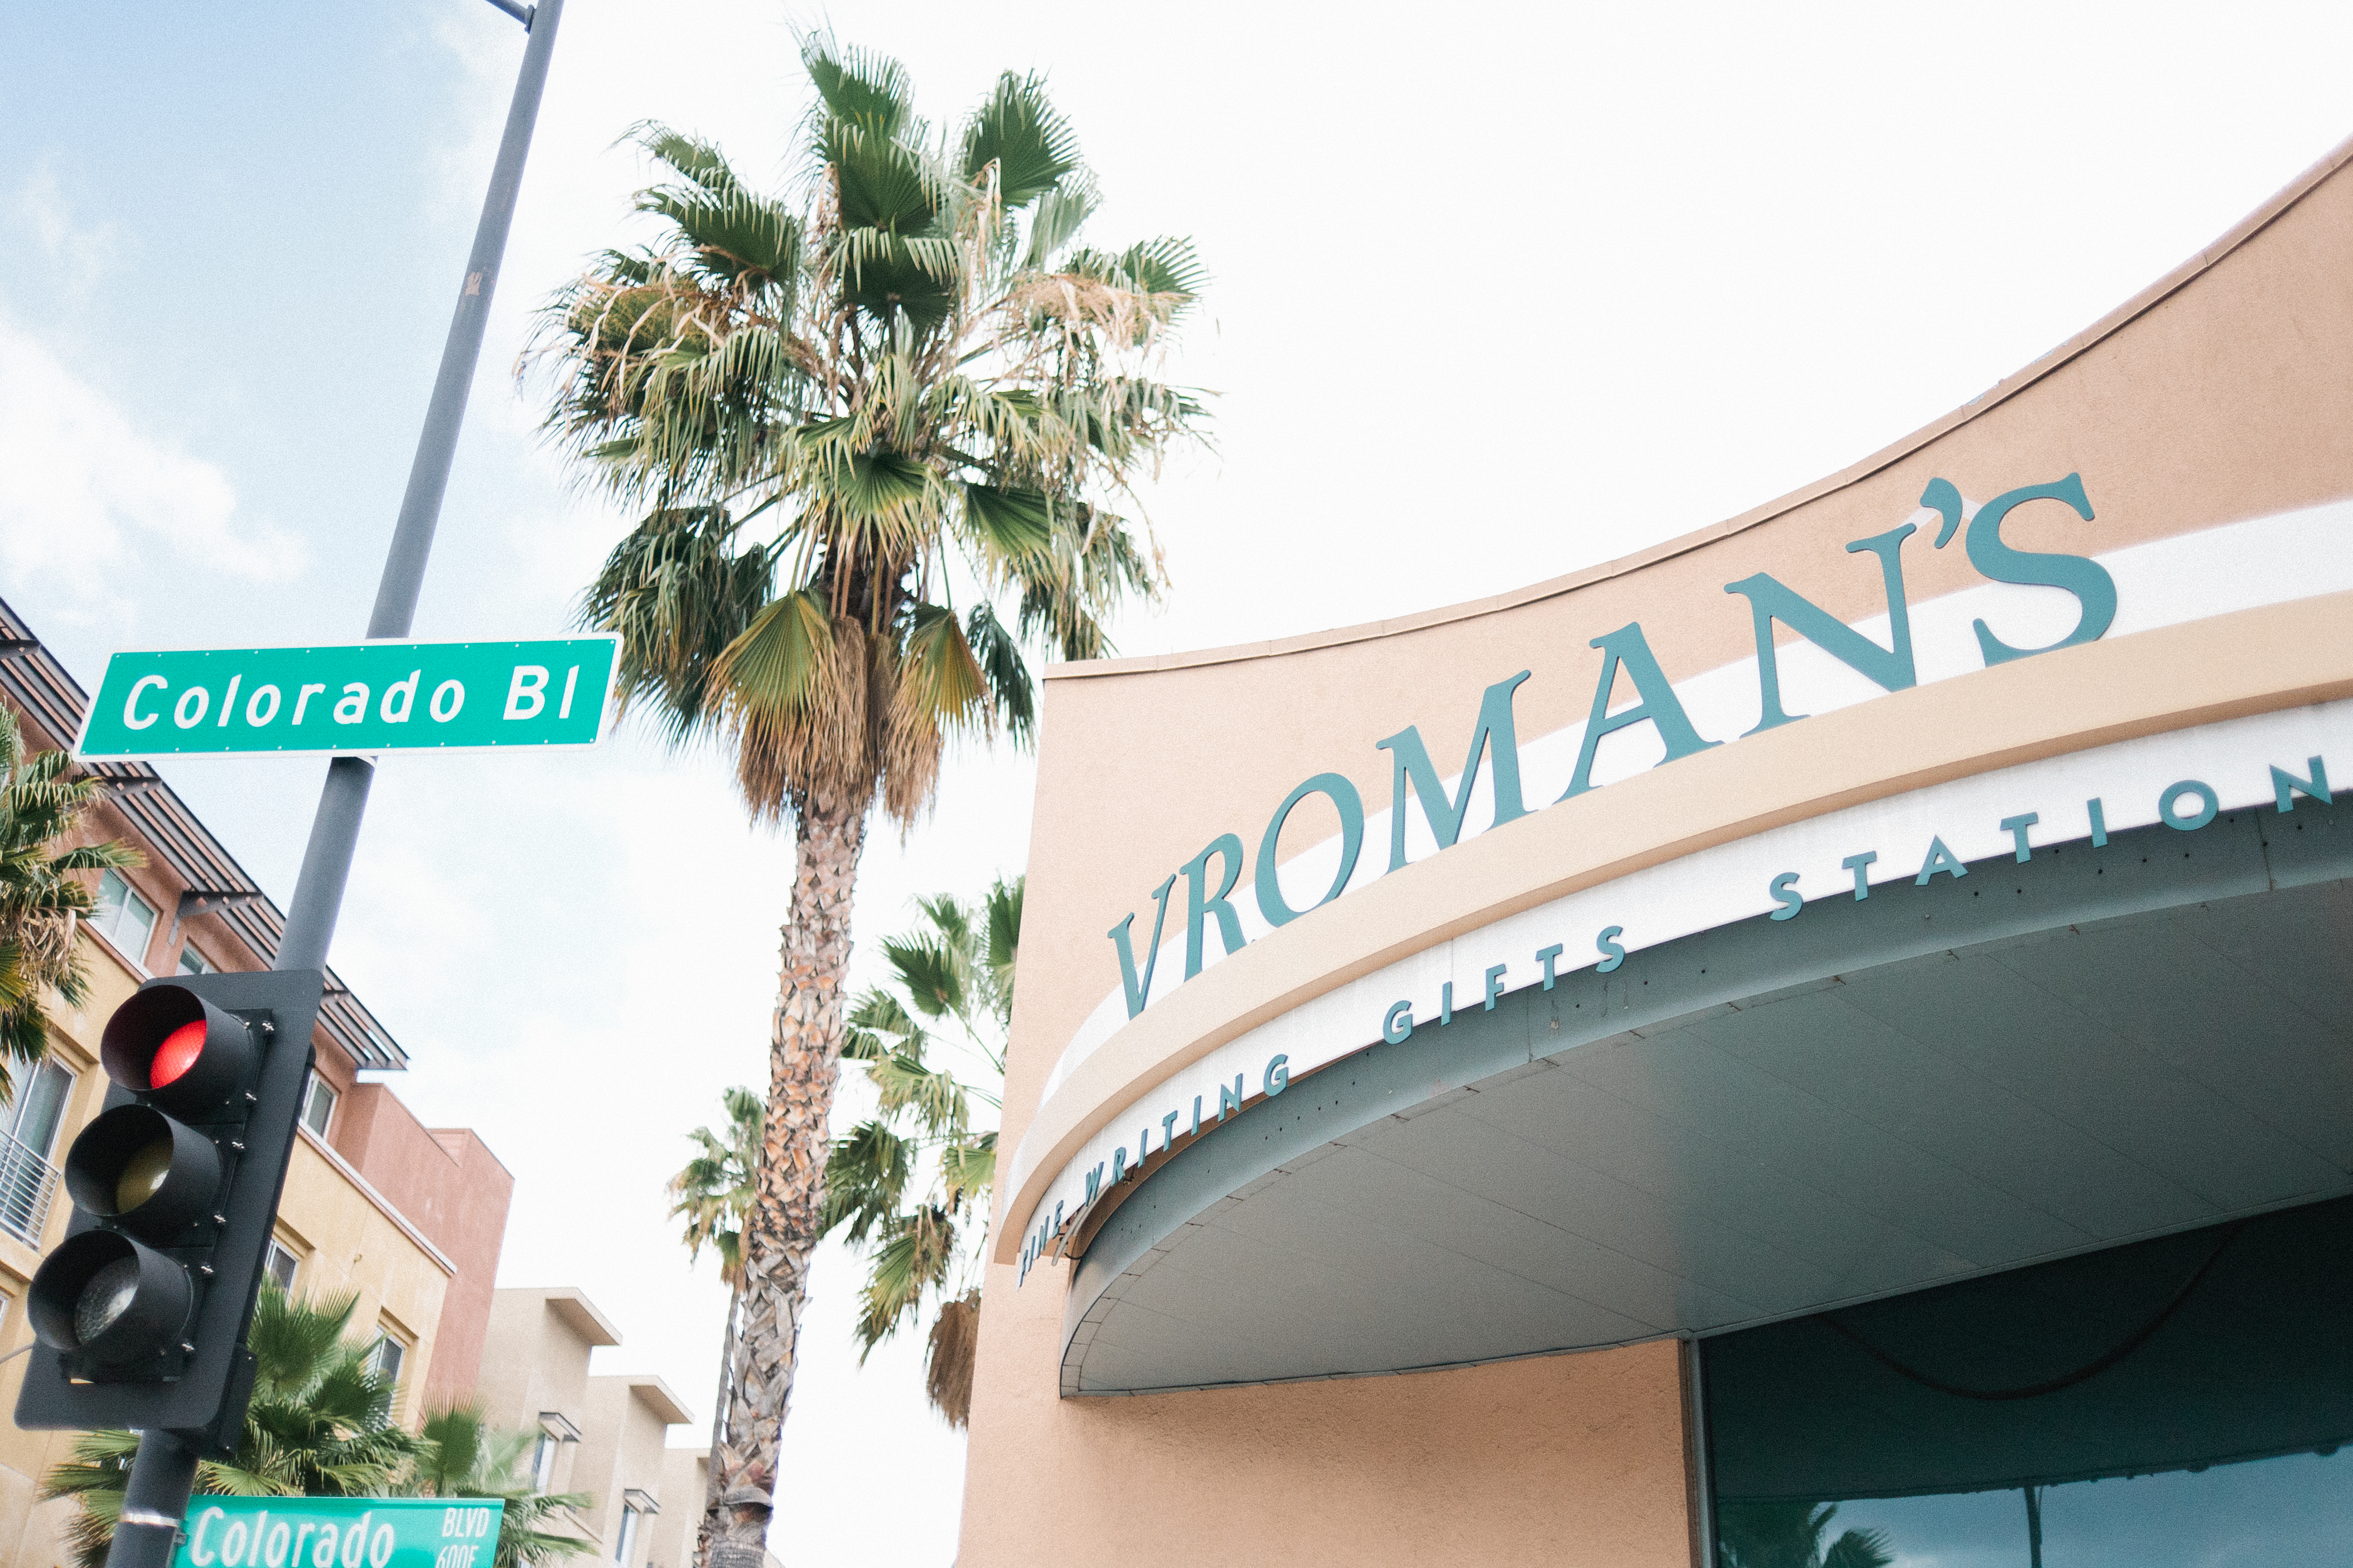 Pasadena wedding photographer Jessica Schilling captures Vroman's book store on Colorado Blvd.